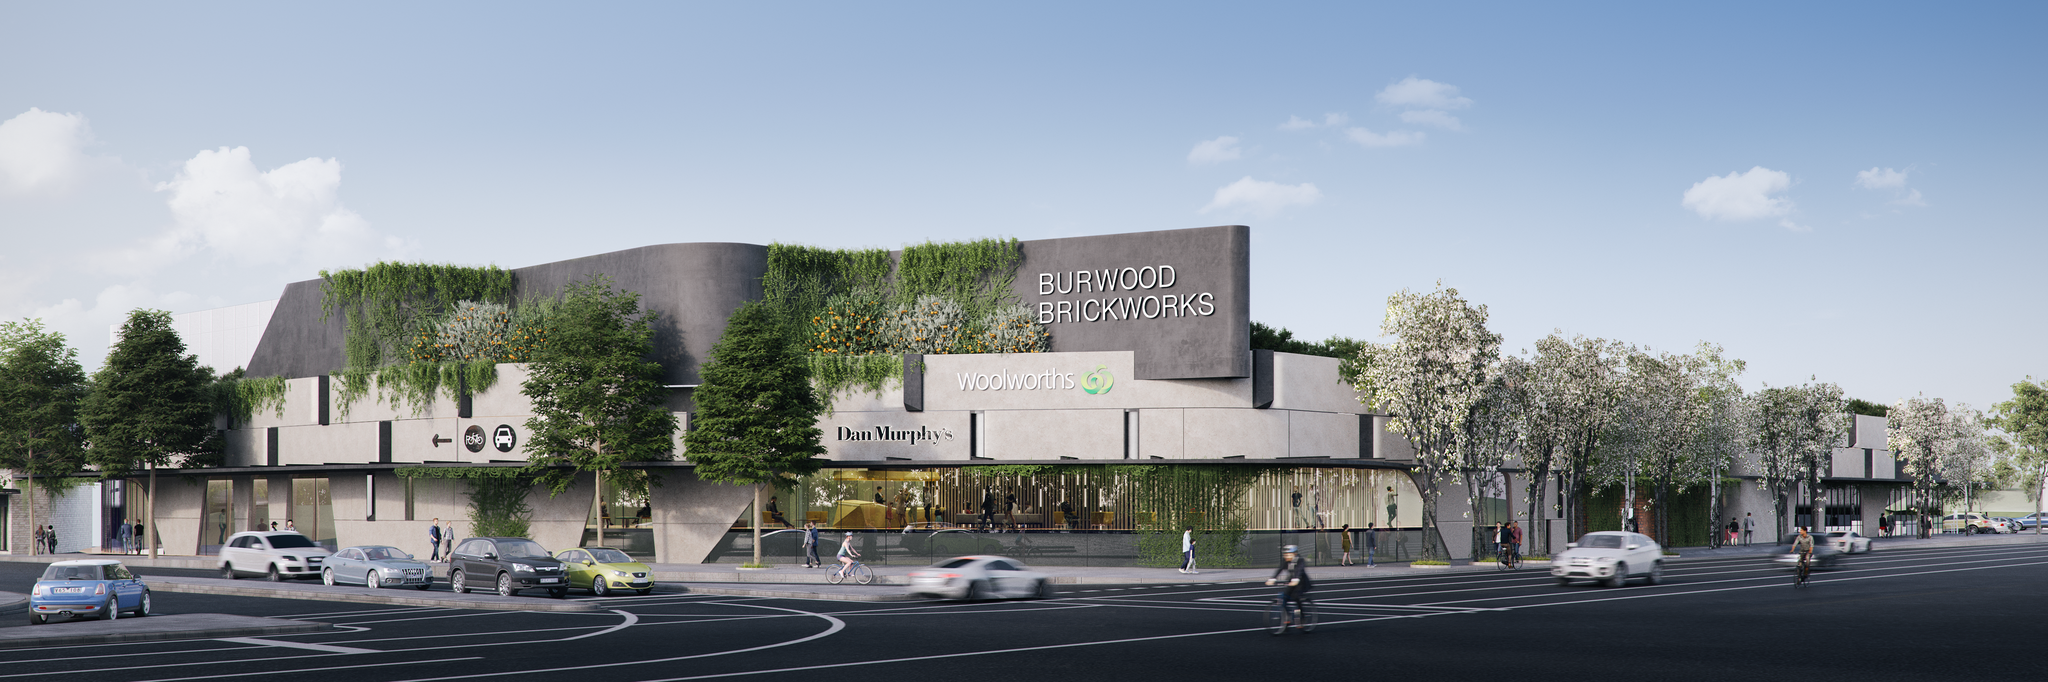 Burwood BrickWorks1